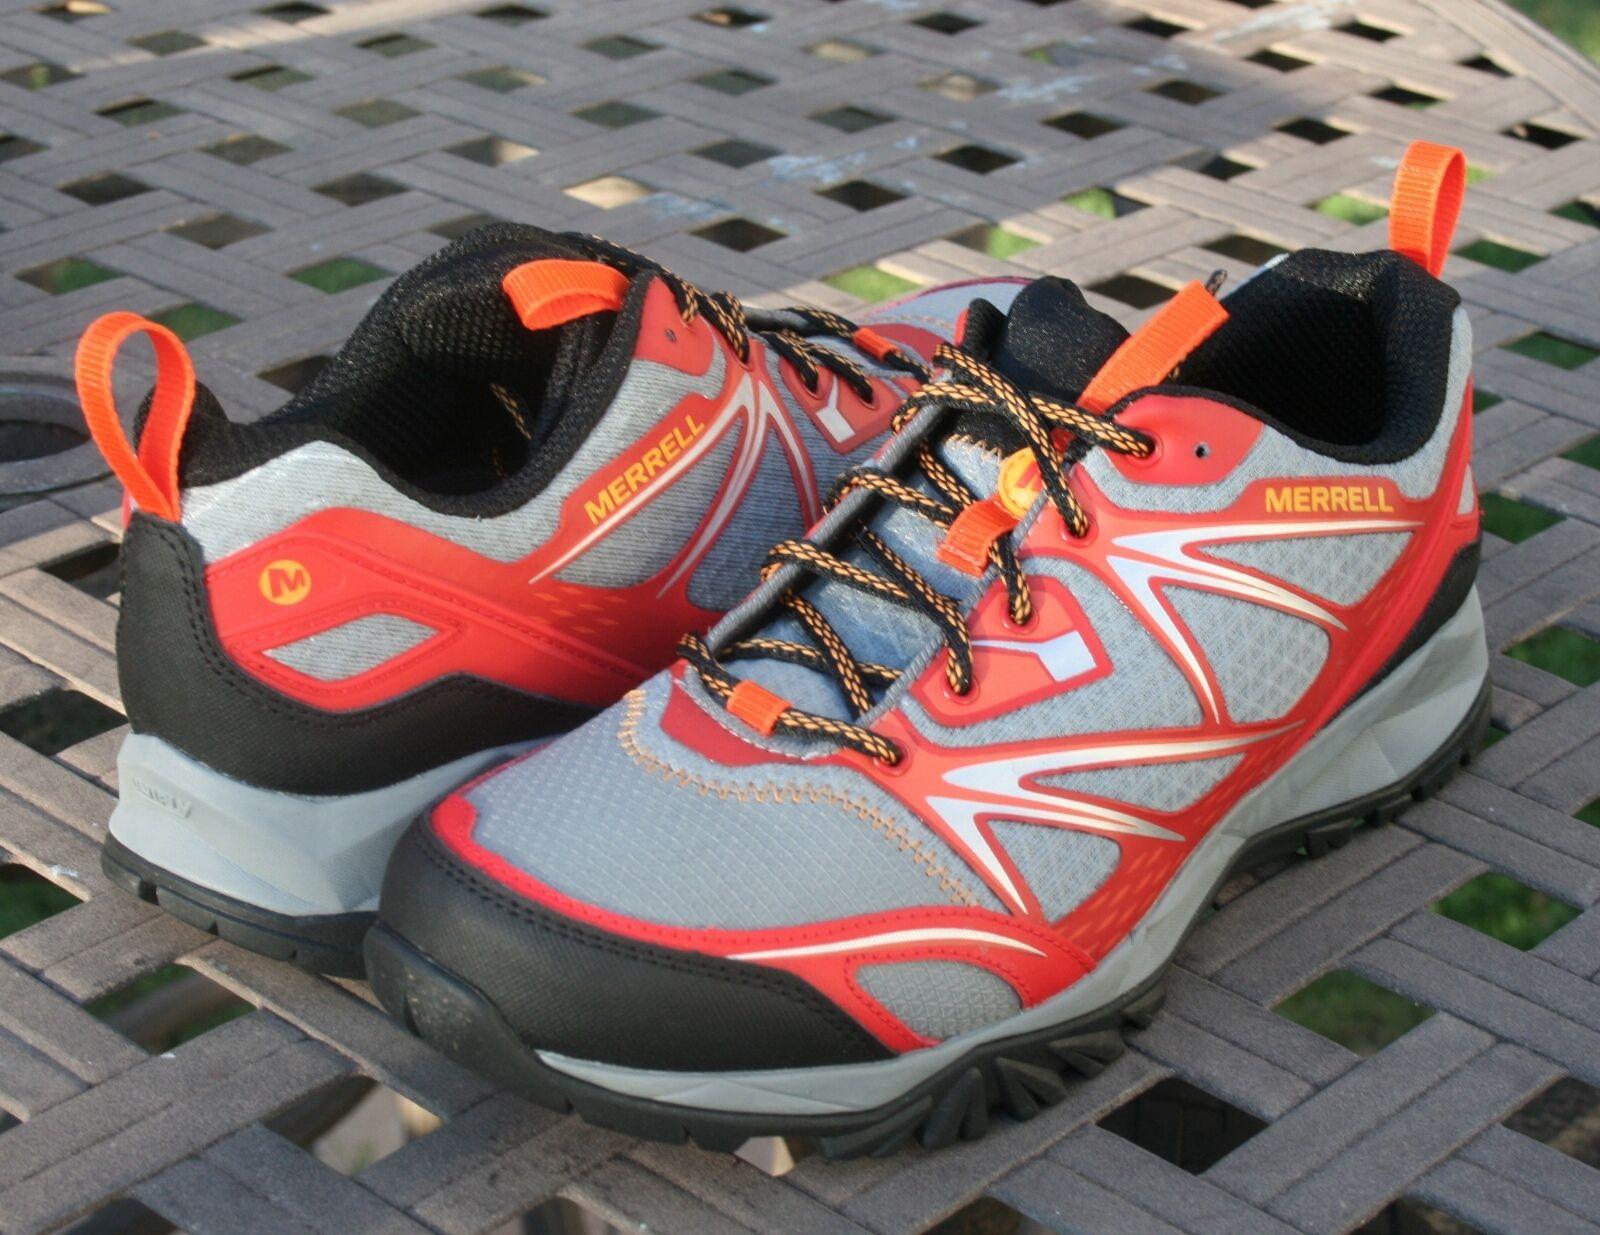 MERRELL CAPRA BOLT US 11.5 Men's Hiking Trail Shoe Bright Red